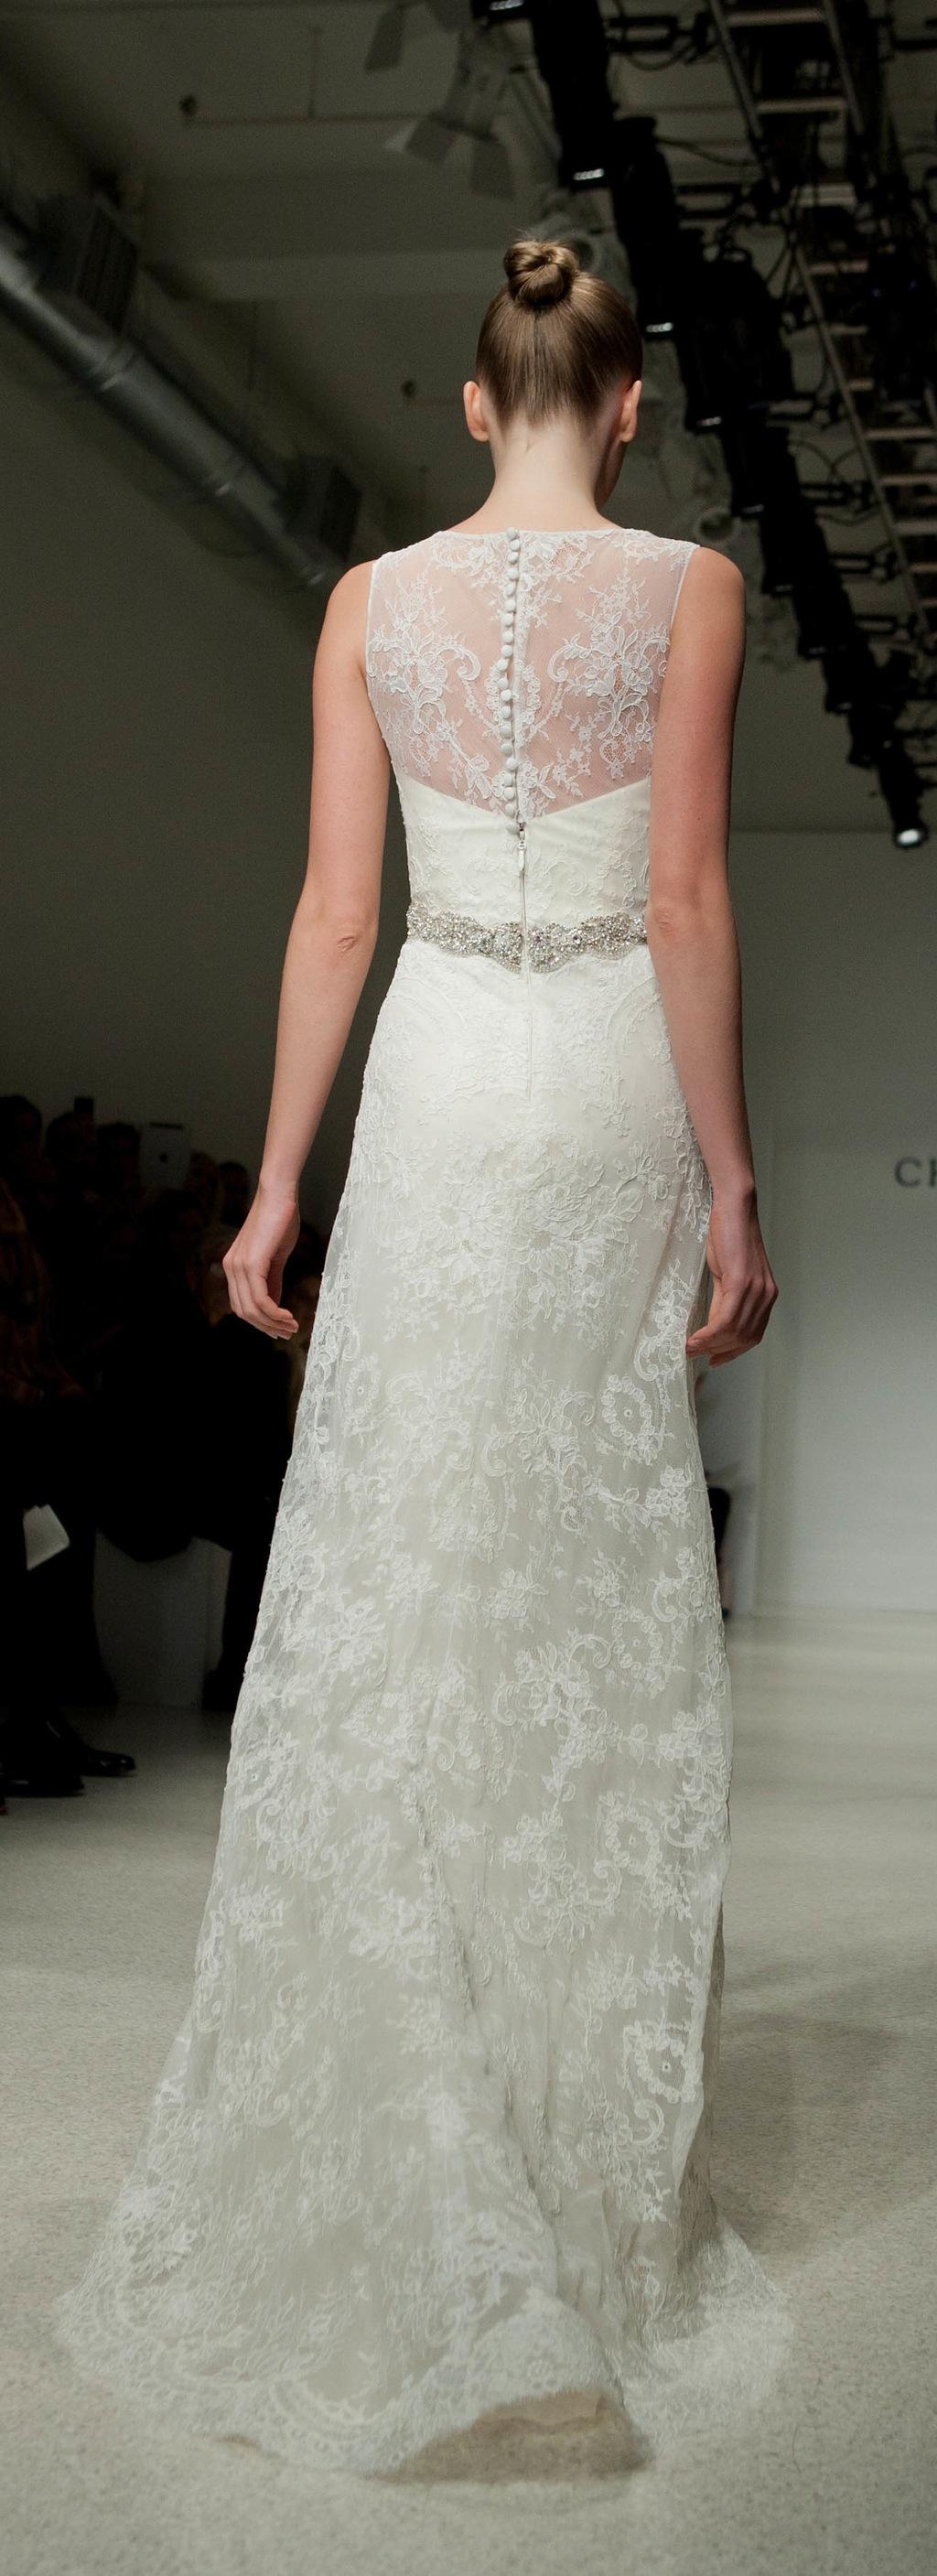 2012_wedding_dress_christos_bridal_gowns_irina_back.full